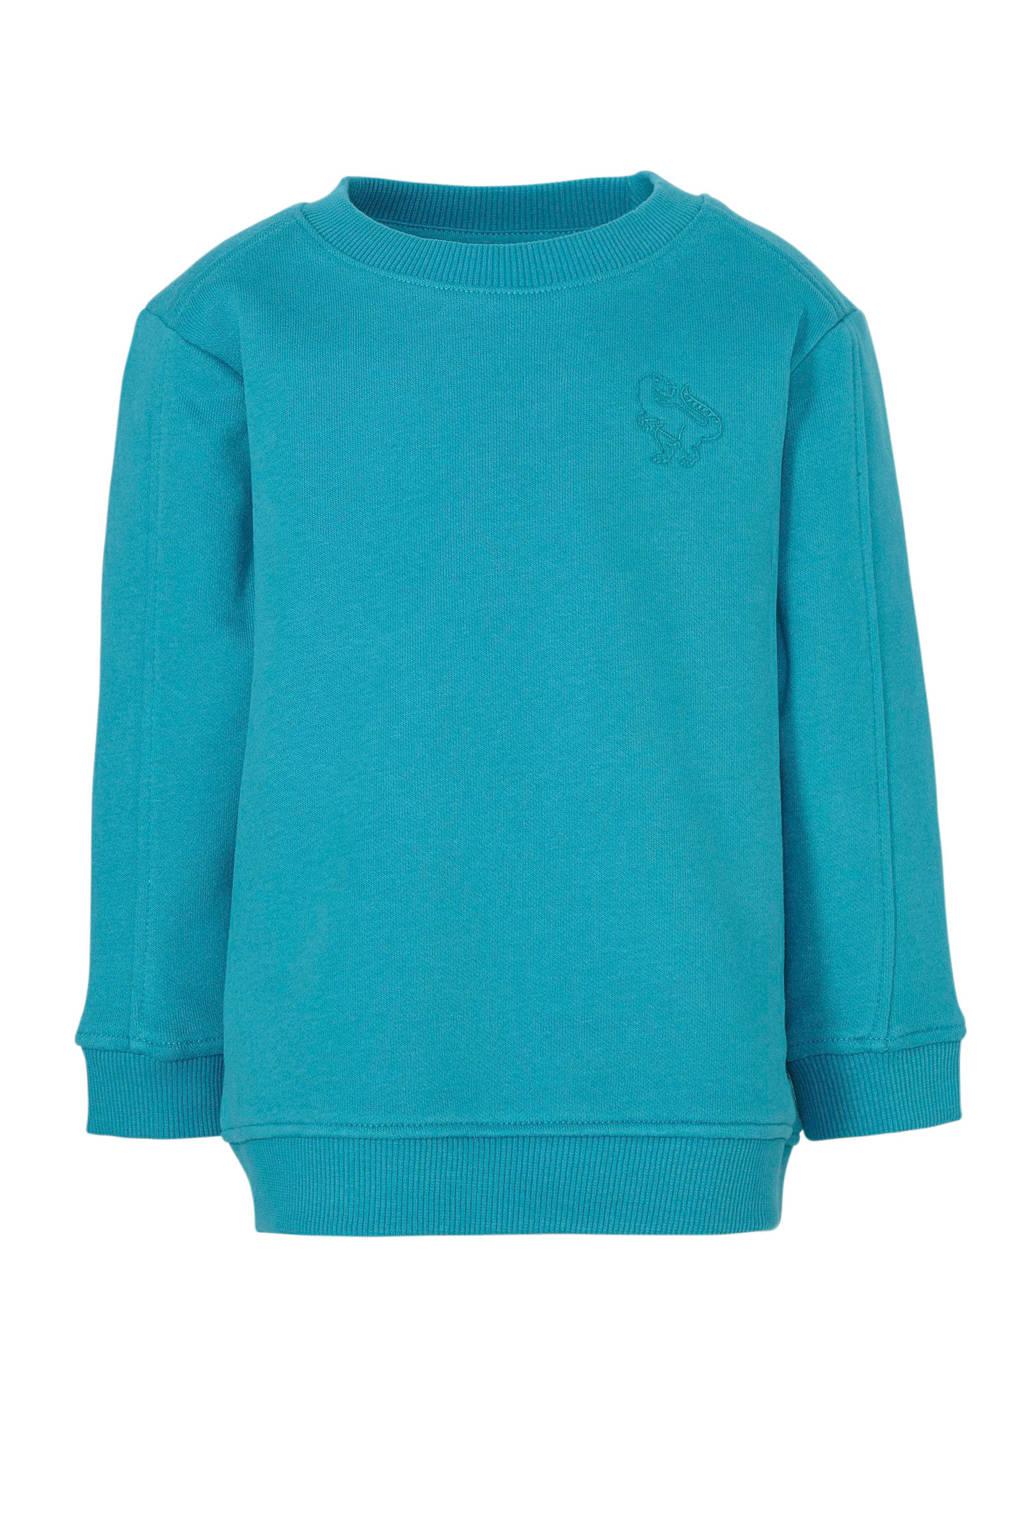 C&A sweater met borduursels blauw, Blauw